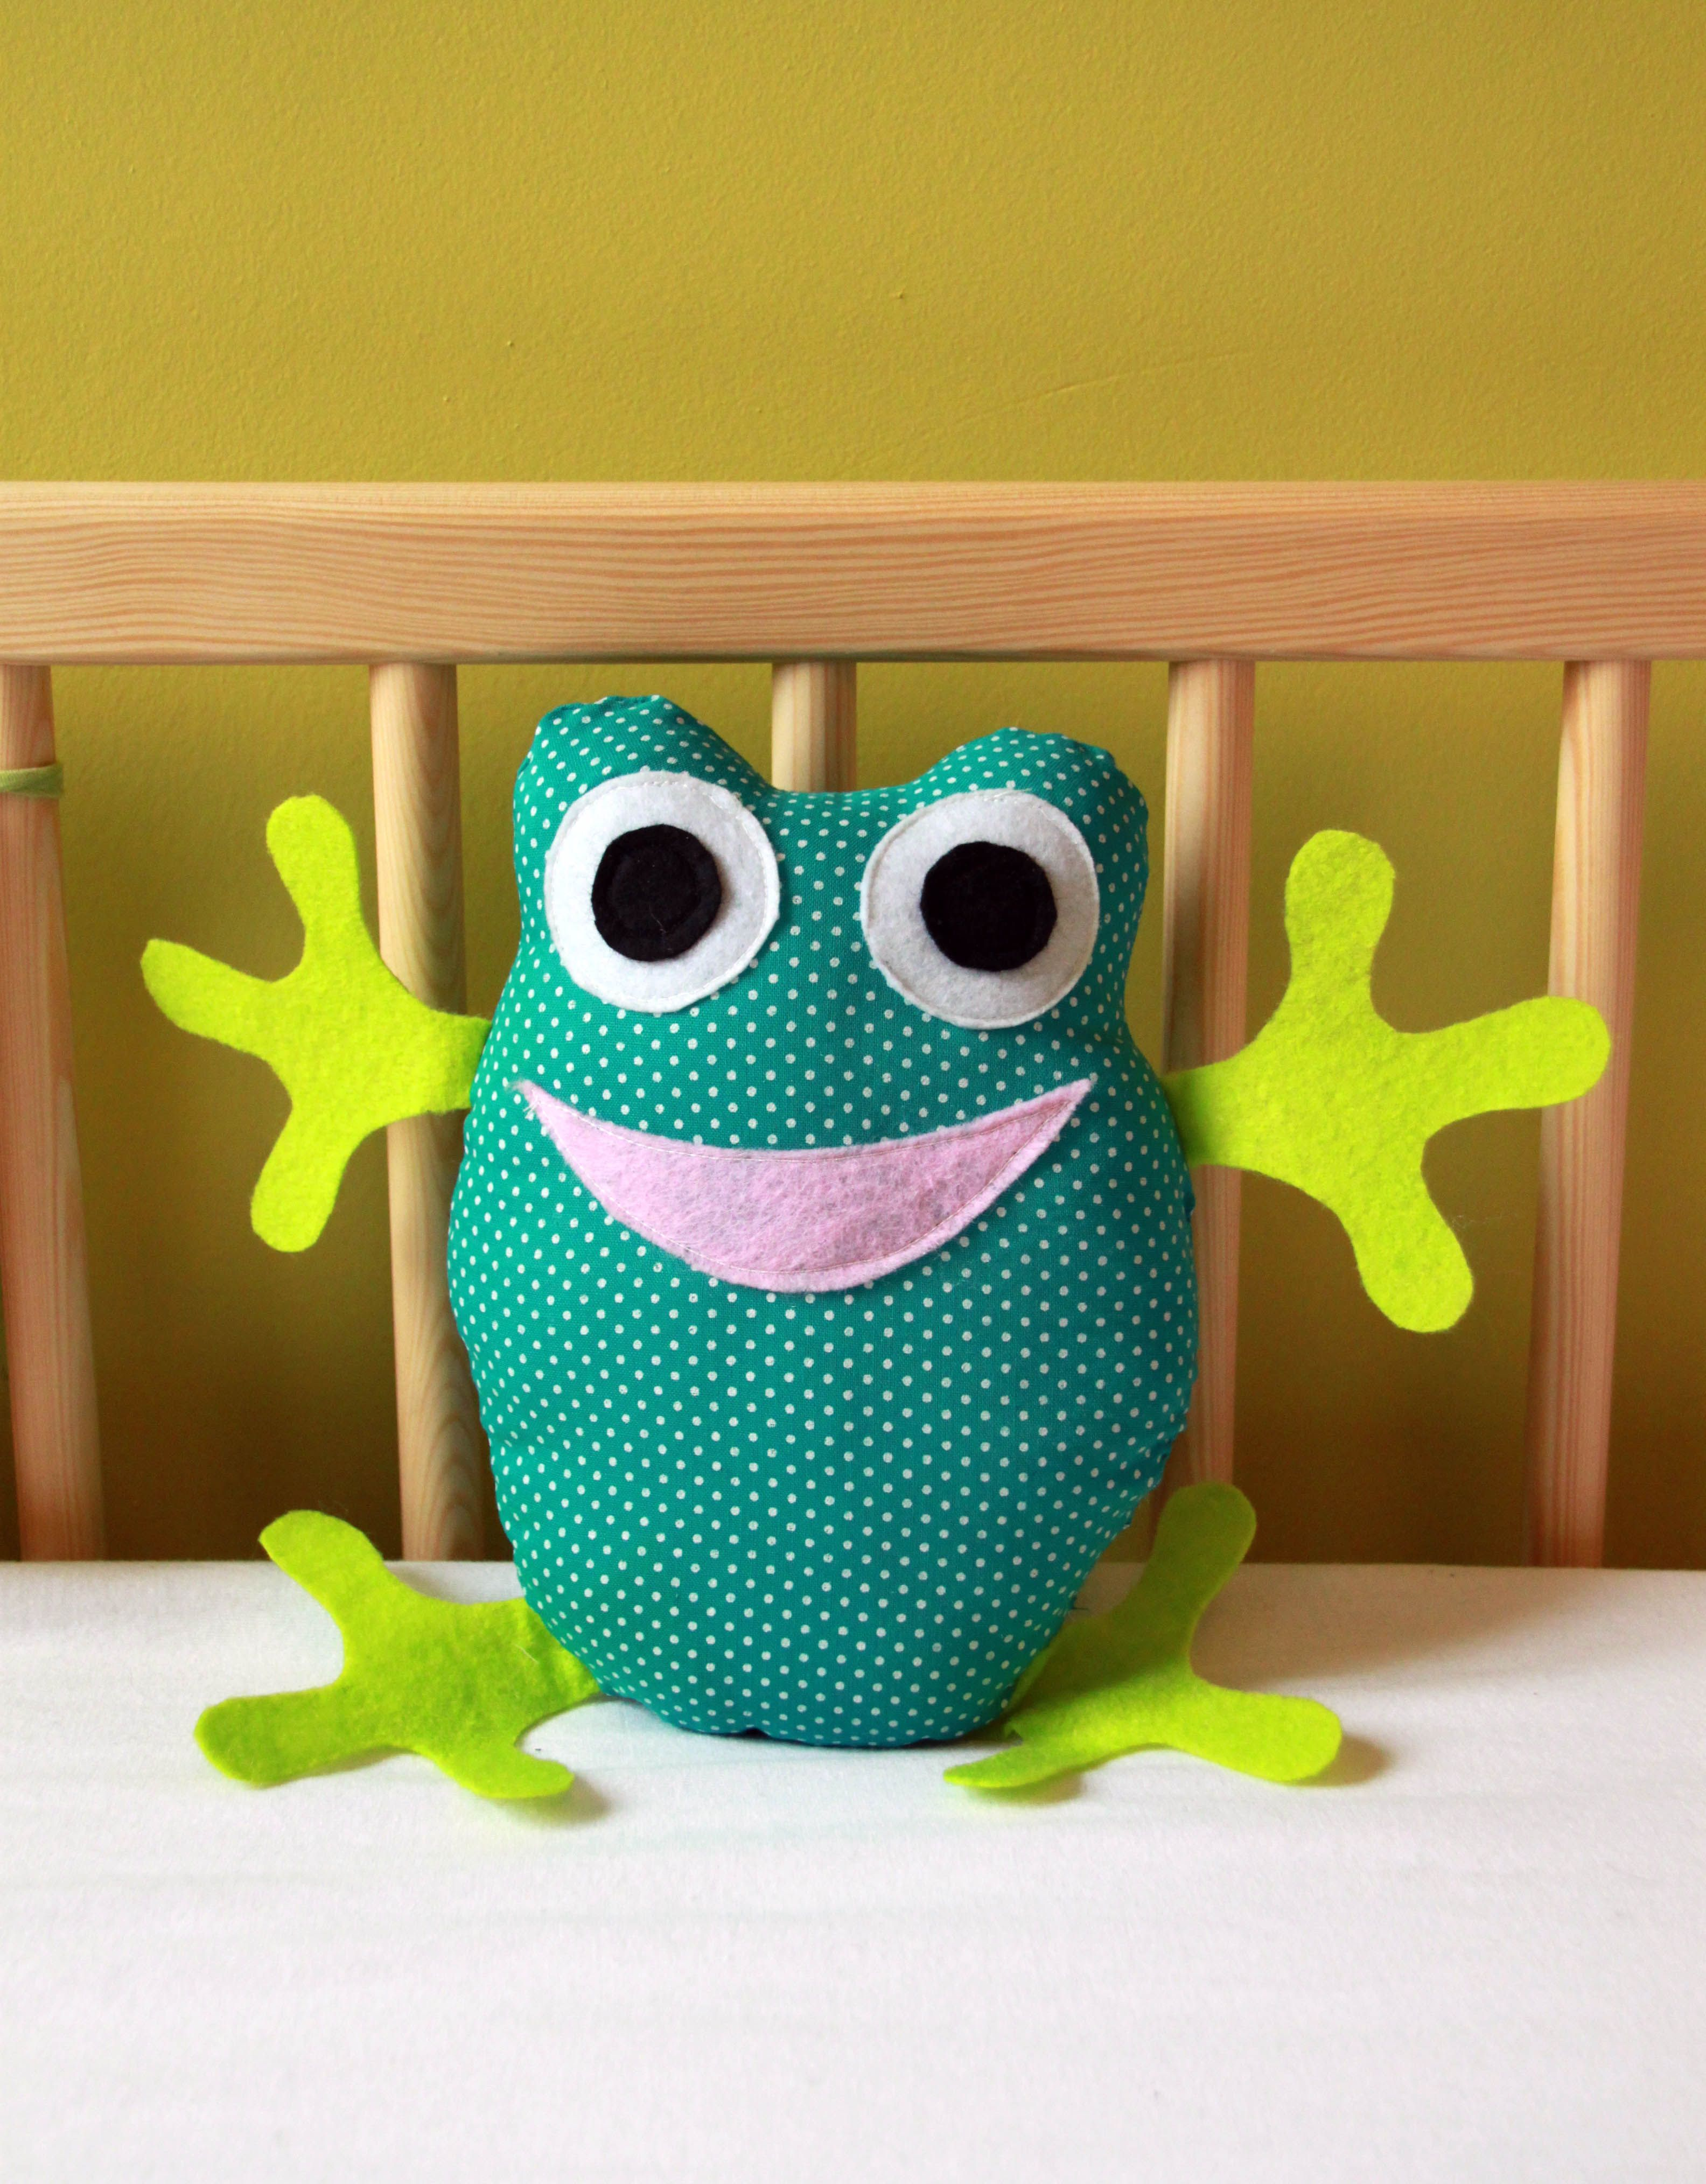 doudou grenouille toys tissus pinterest doudou. Black Bedroom Furniture Sets. Home Design Ideas